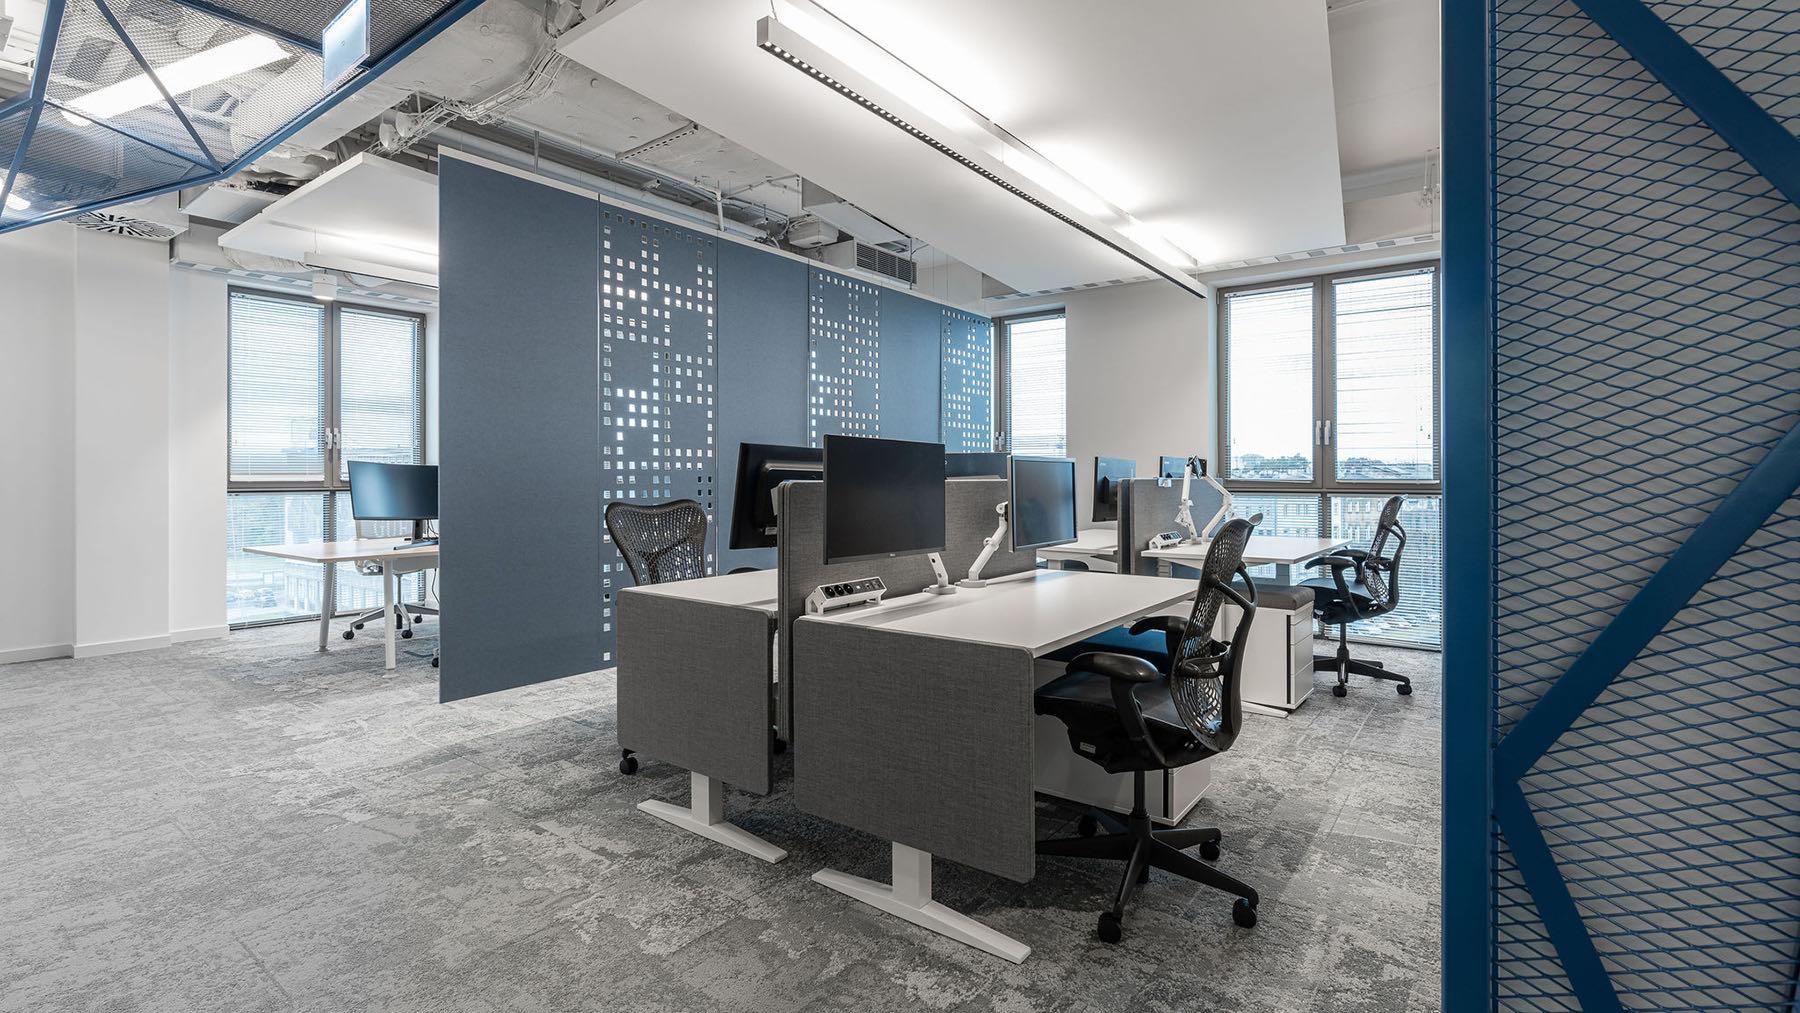 autodesk-krakow-office-31